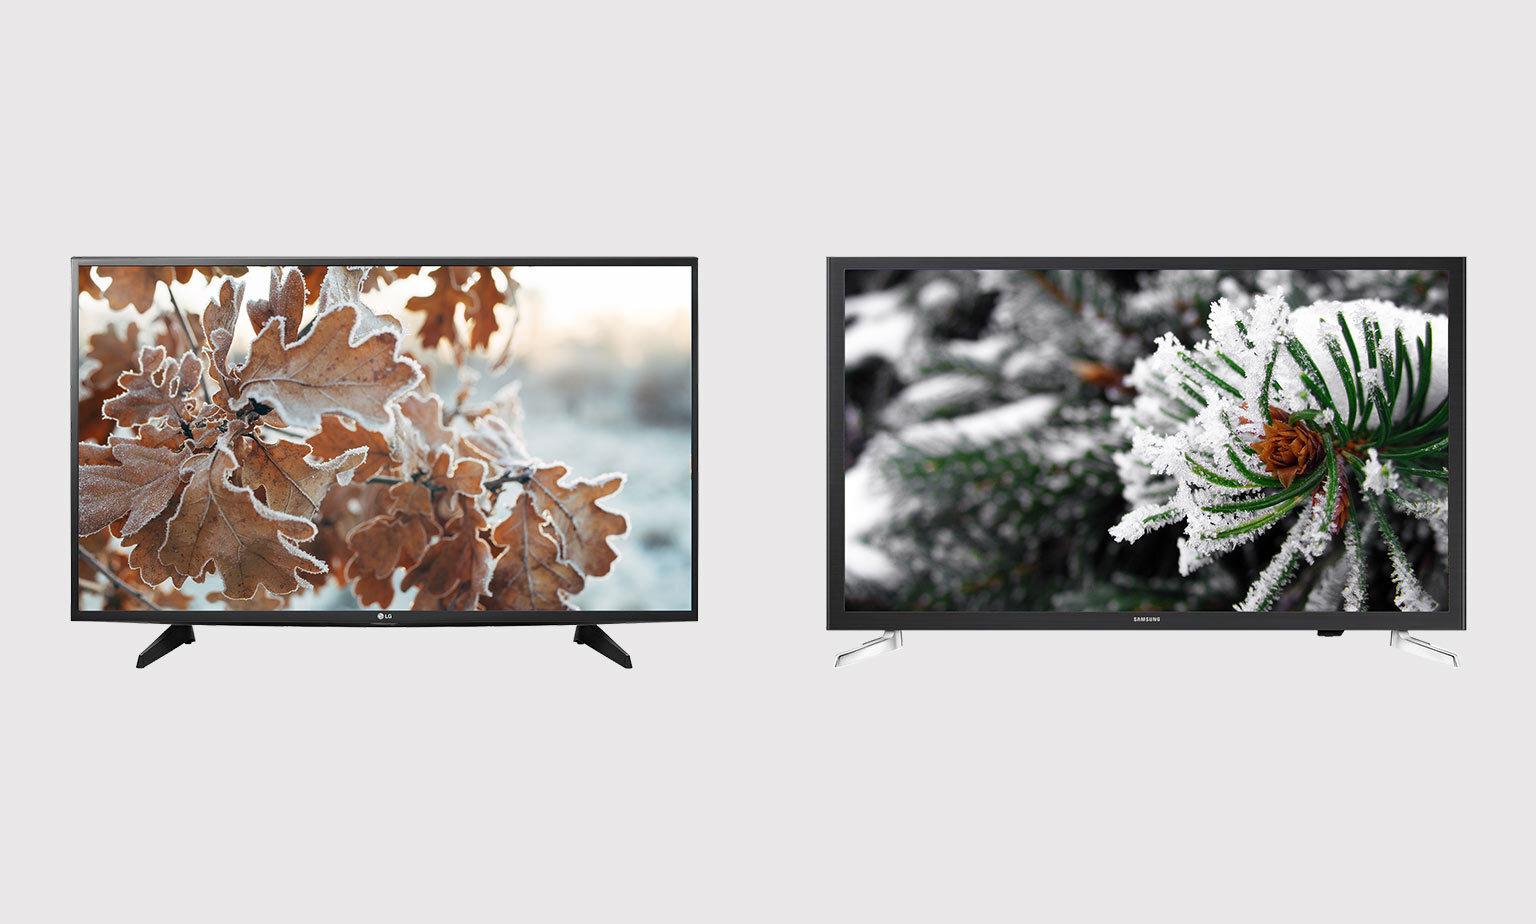 Top-Selling TVs Under $500